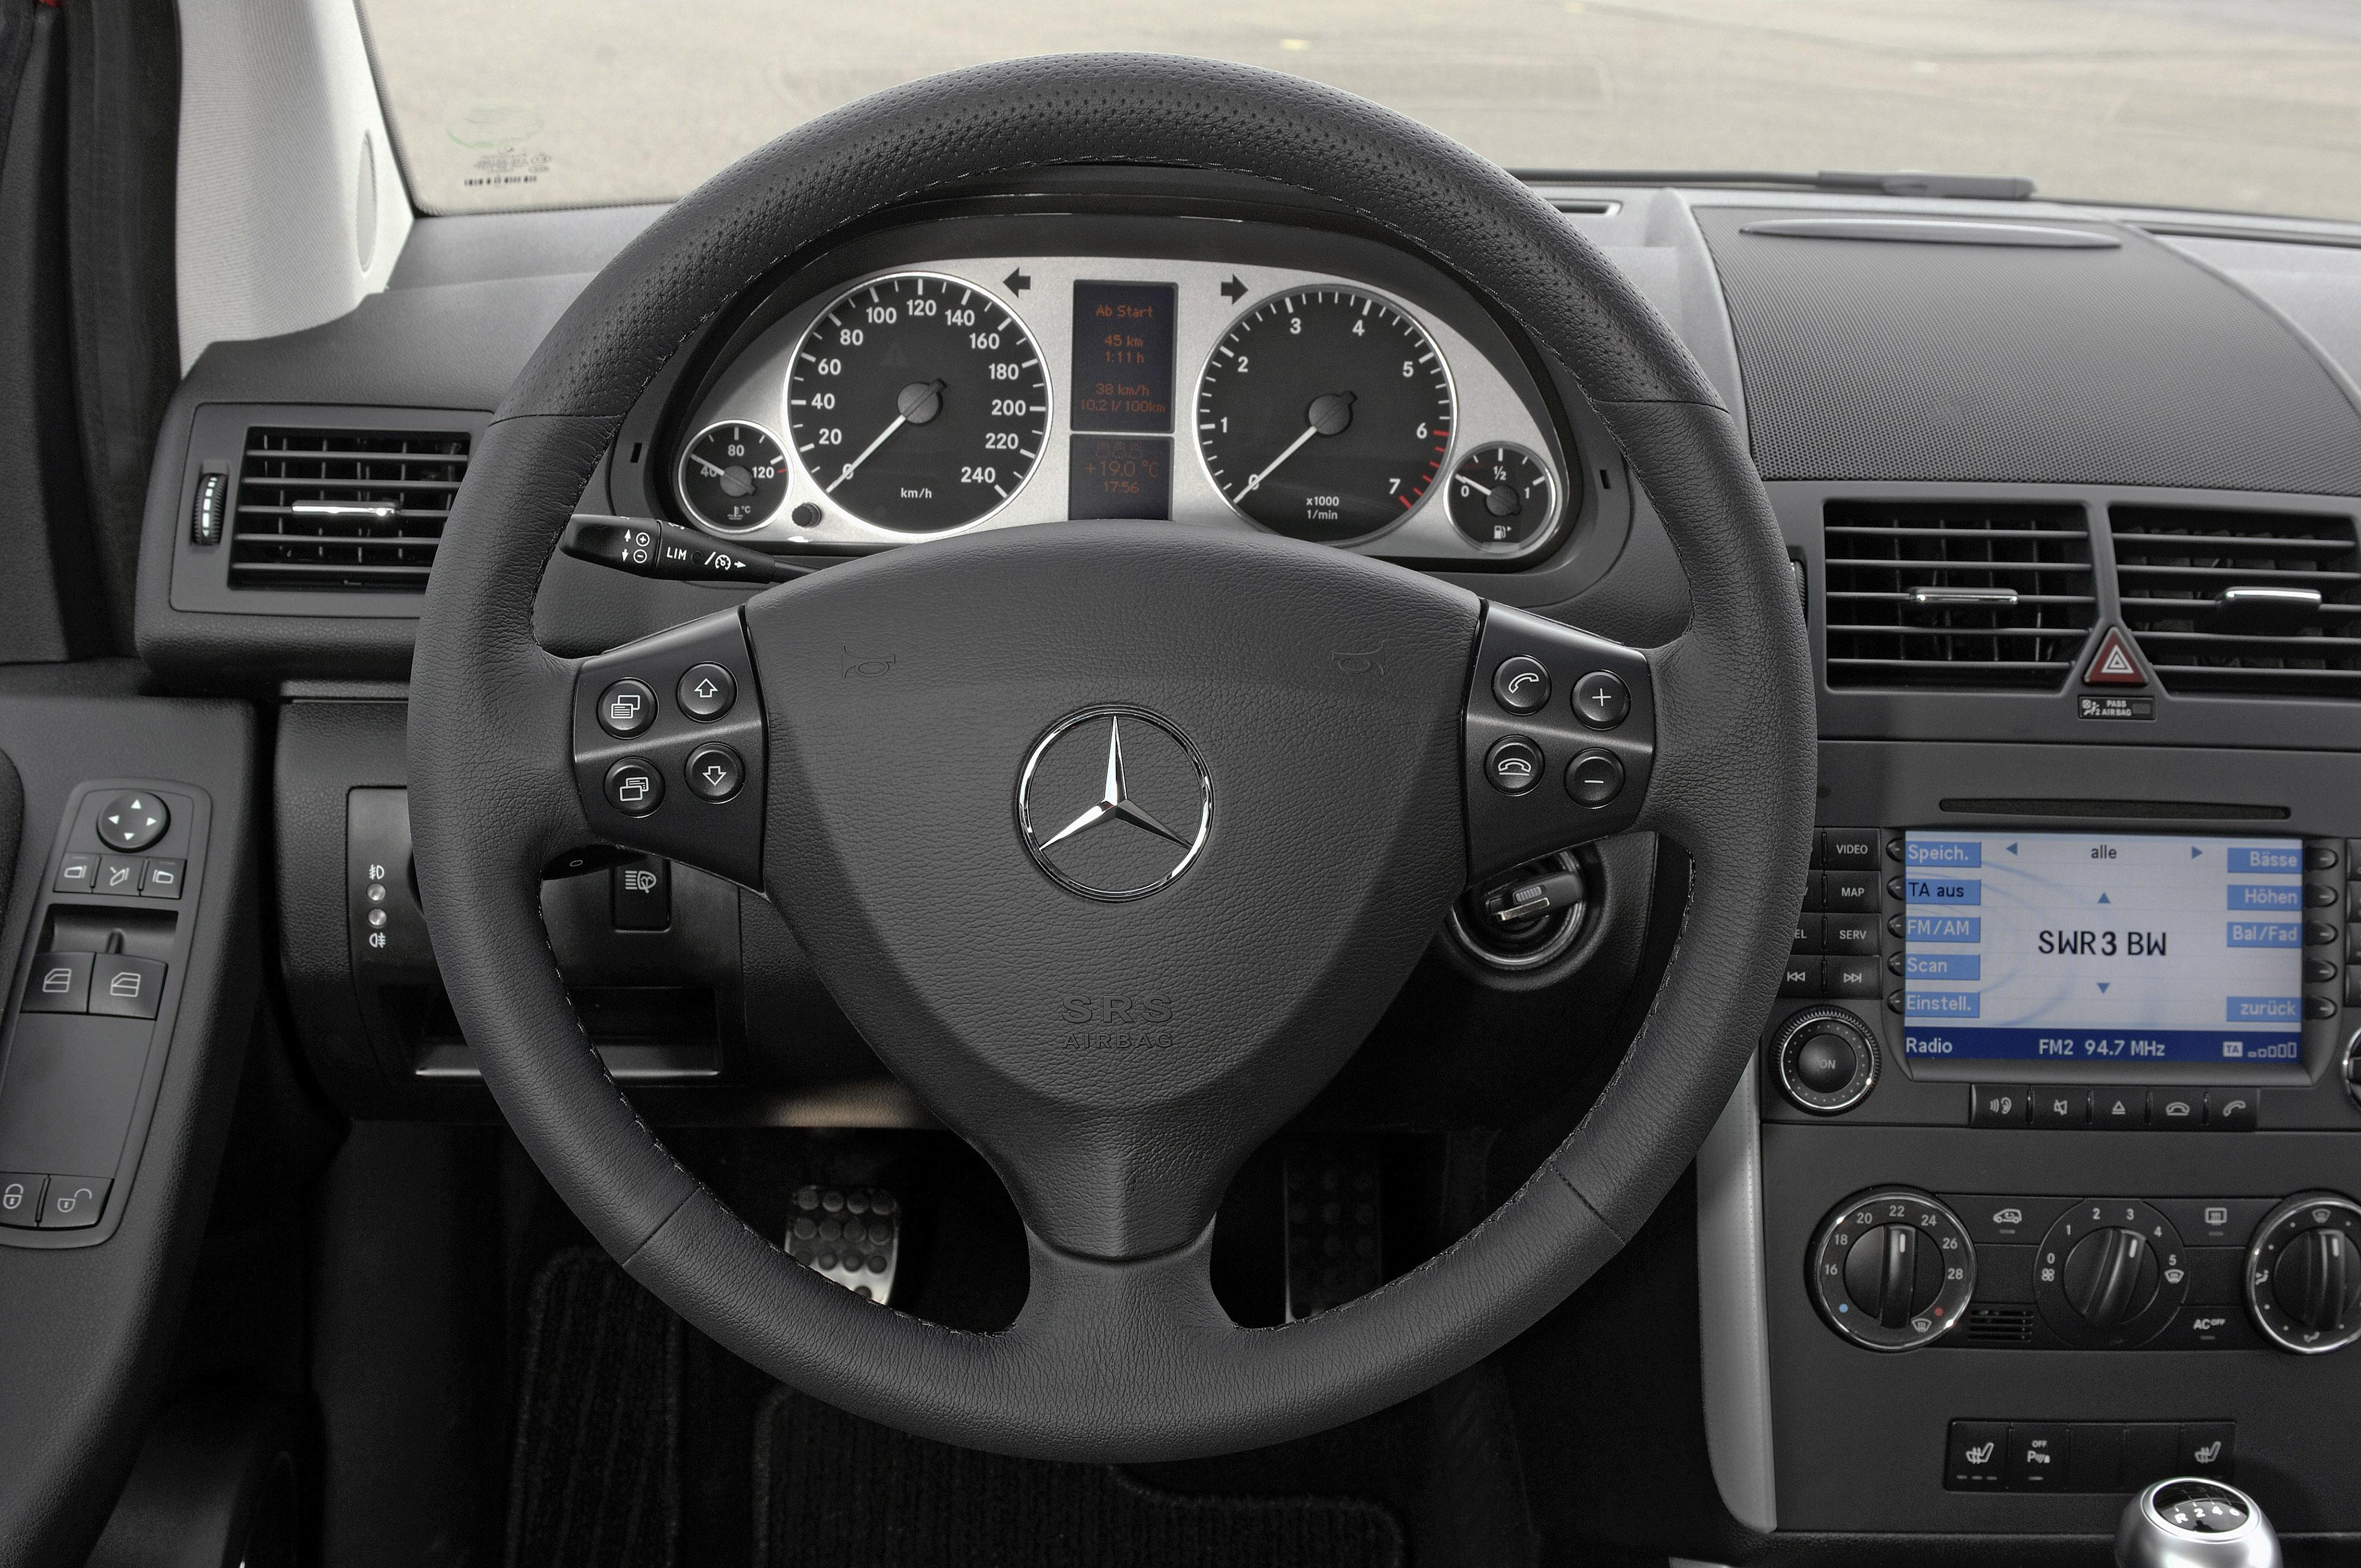 Mercedes Benz A Klasse W169 Specs Amp Photos 2004 2005